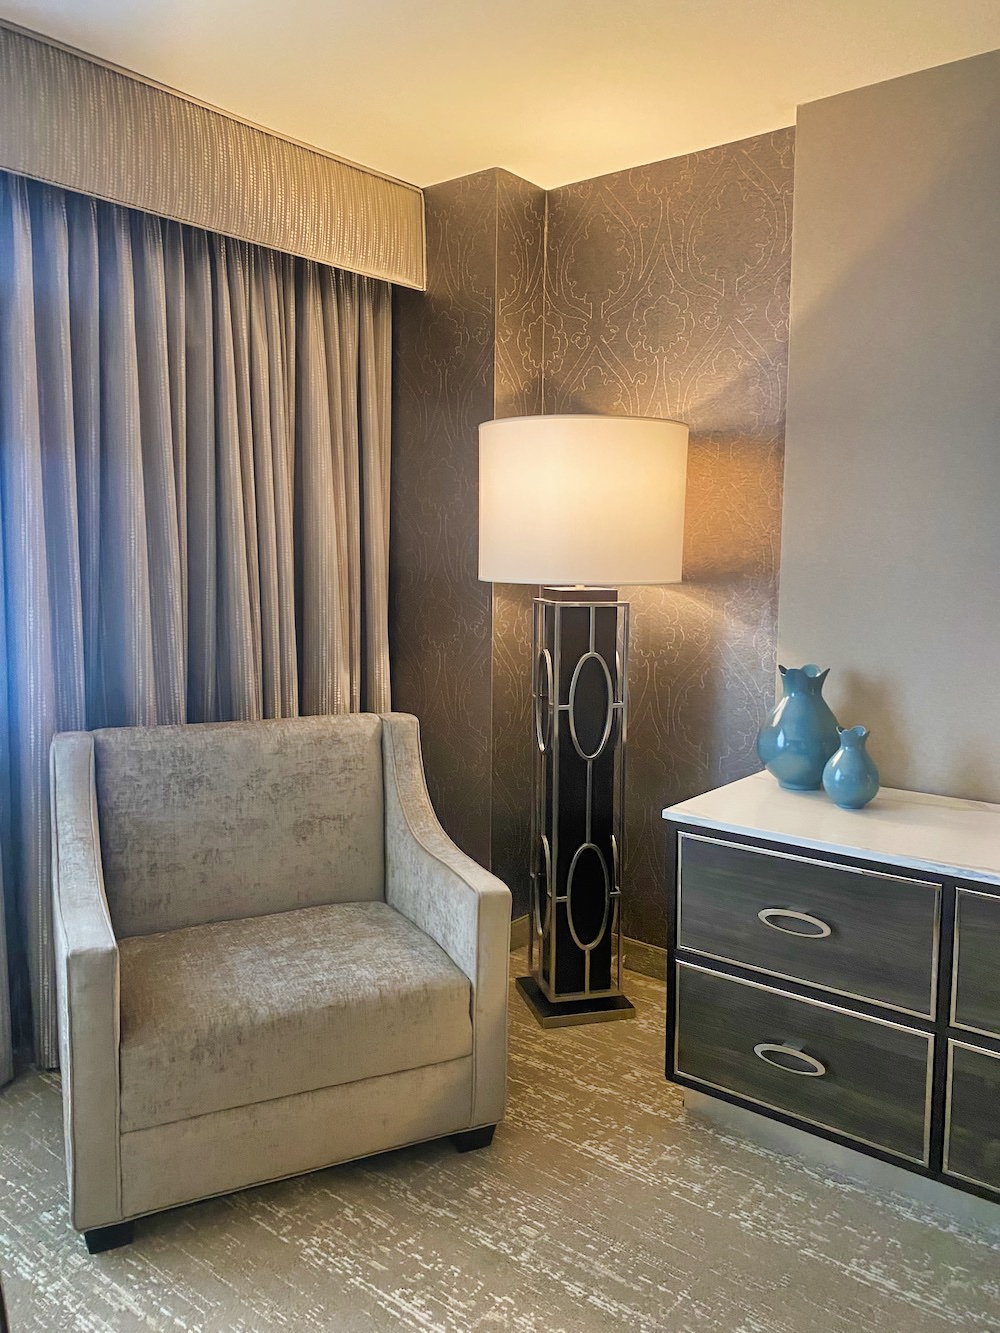 Reno - Grand Sierra Resort Room